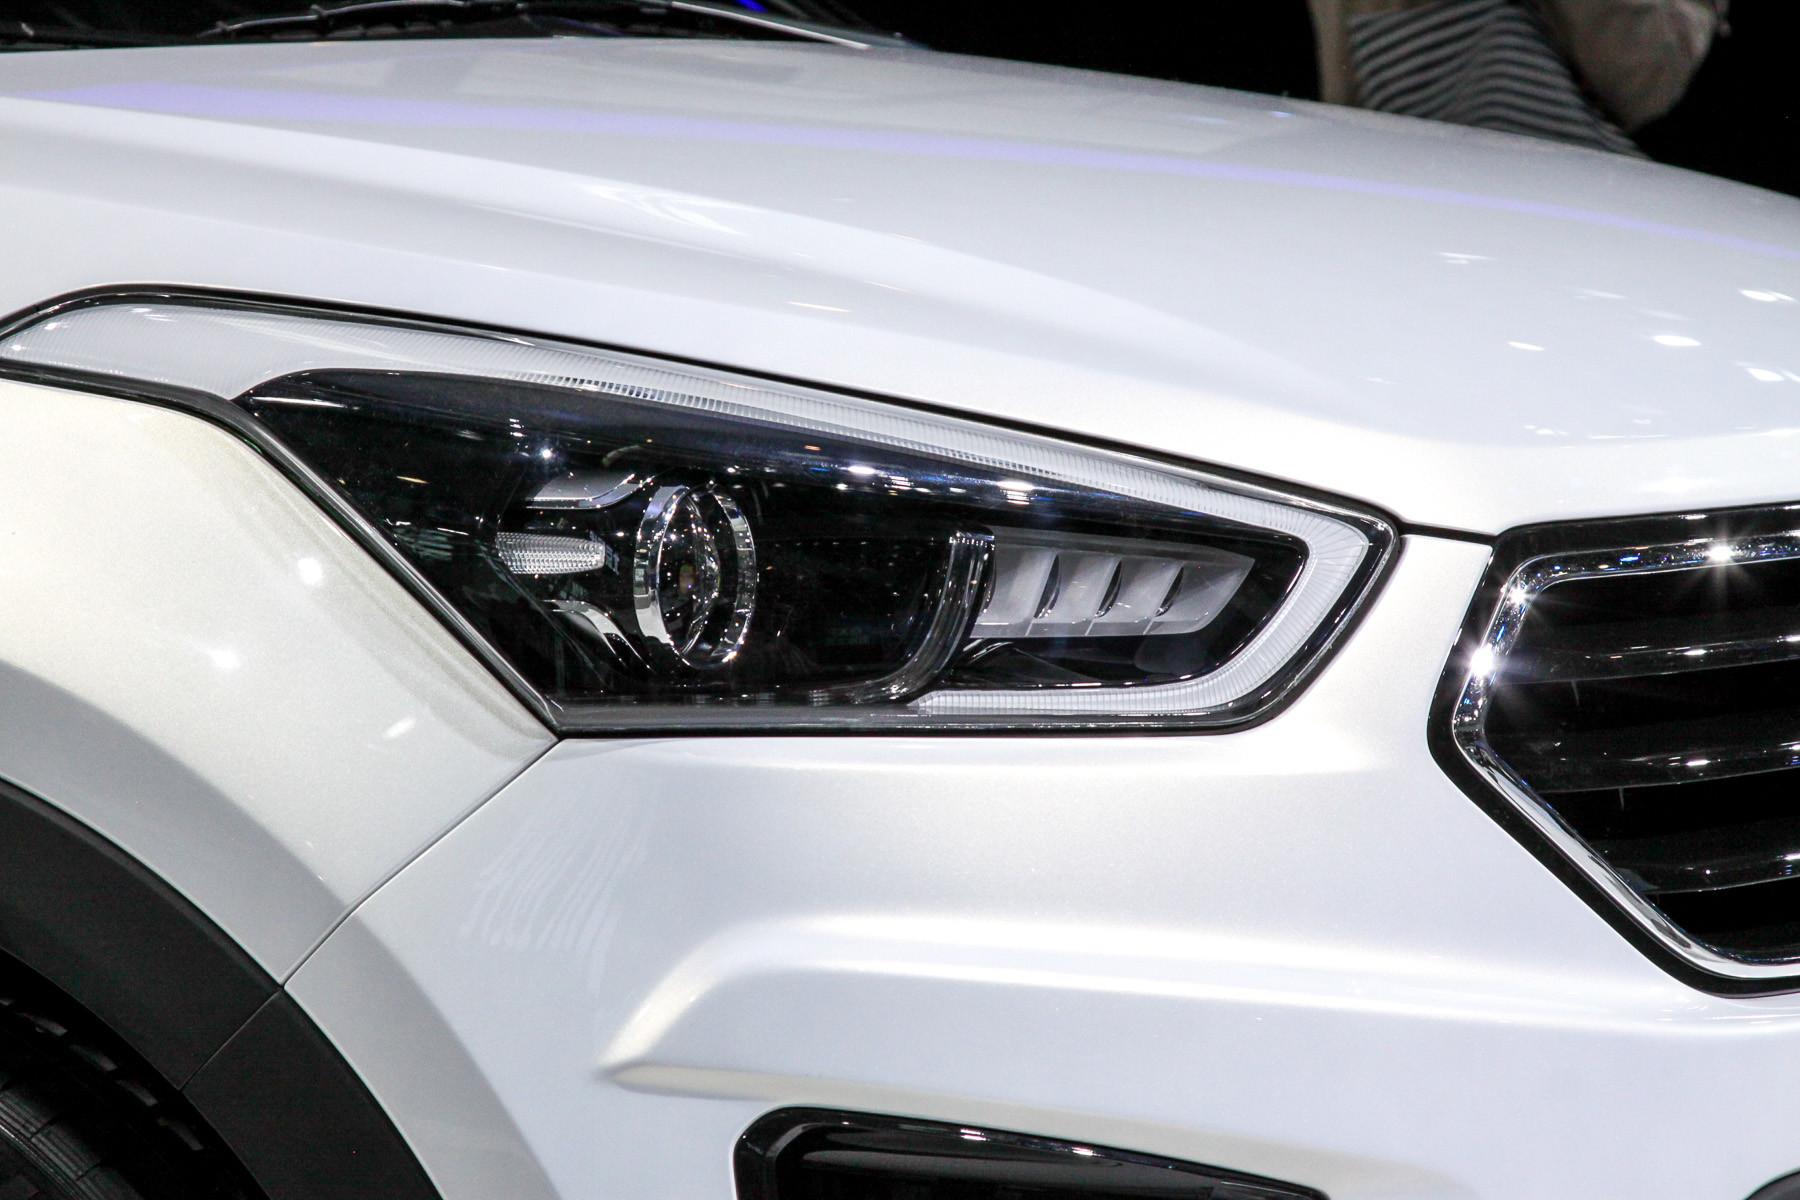 india blog sp news the tag suv korean car kia all archives